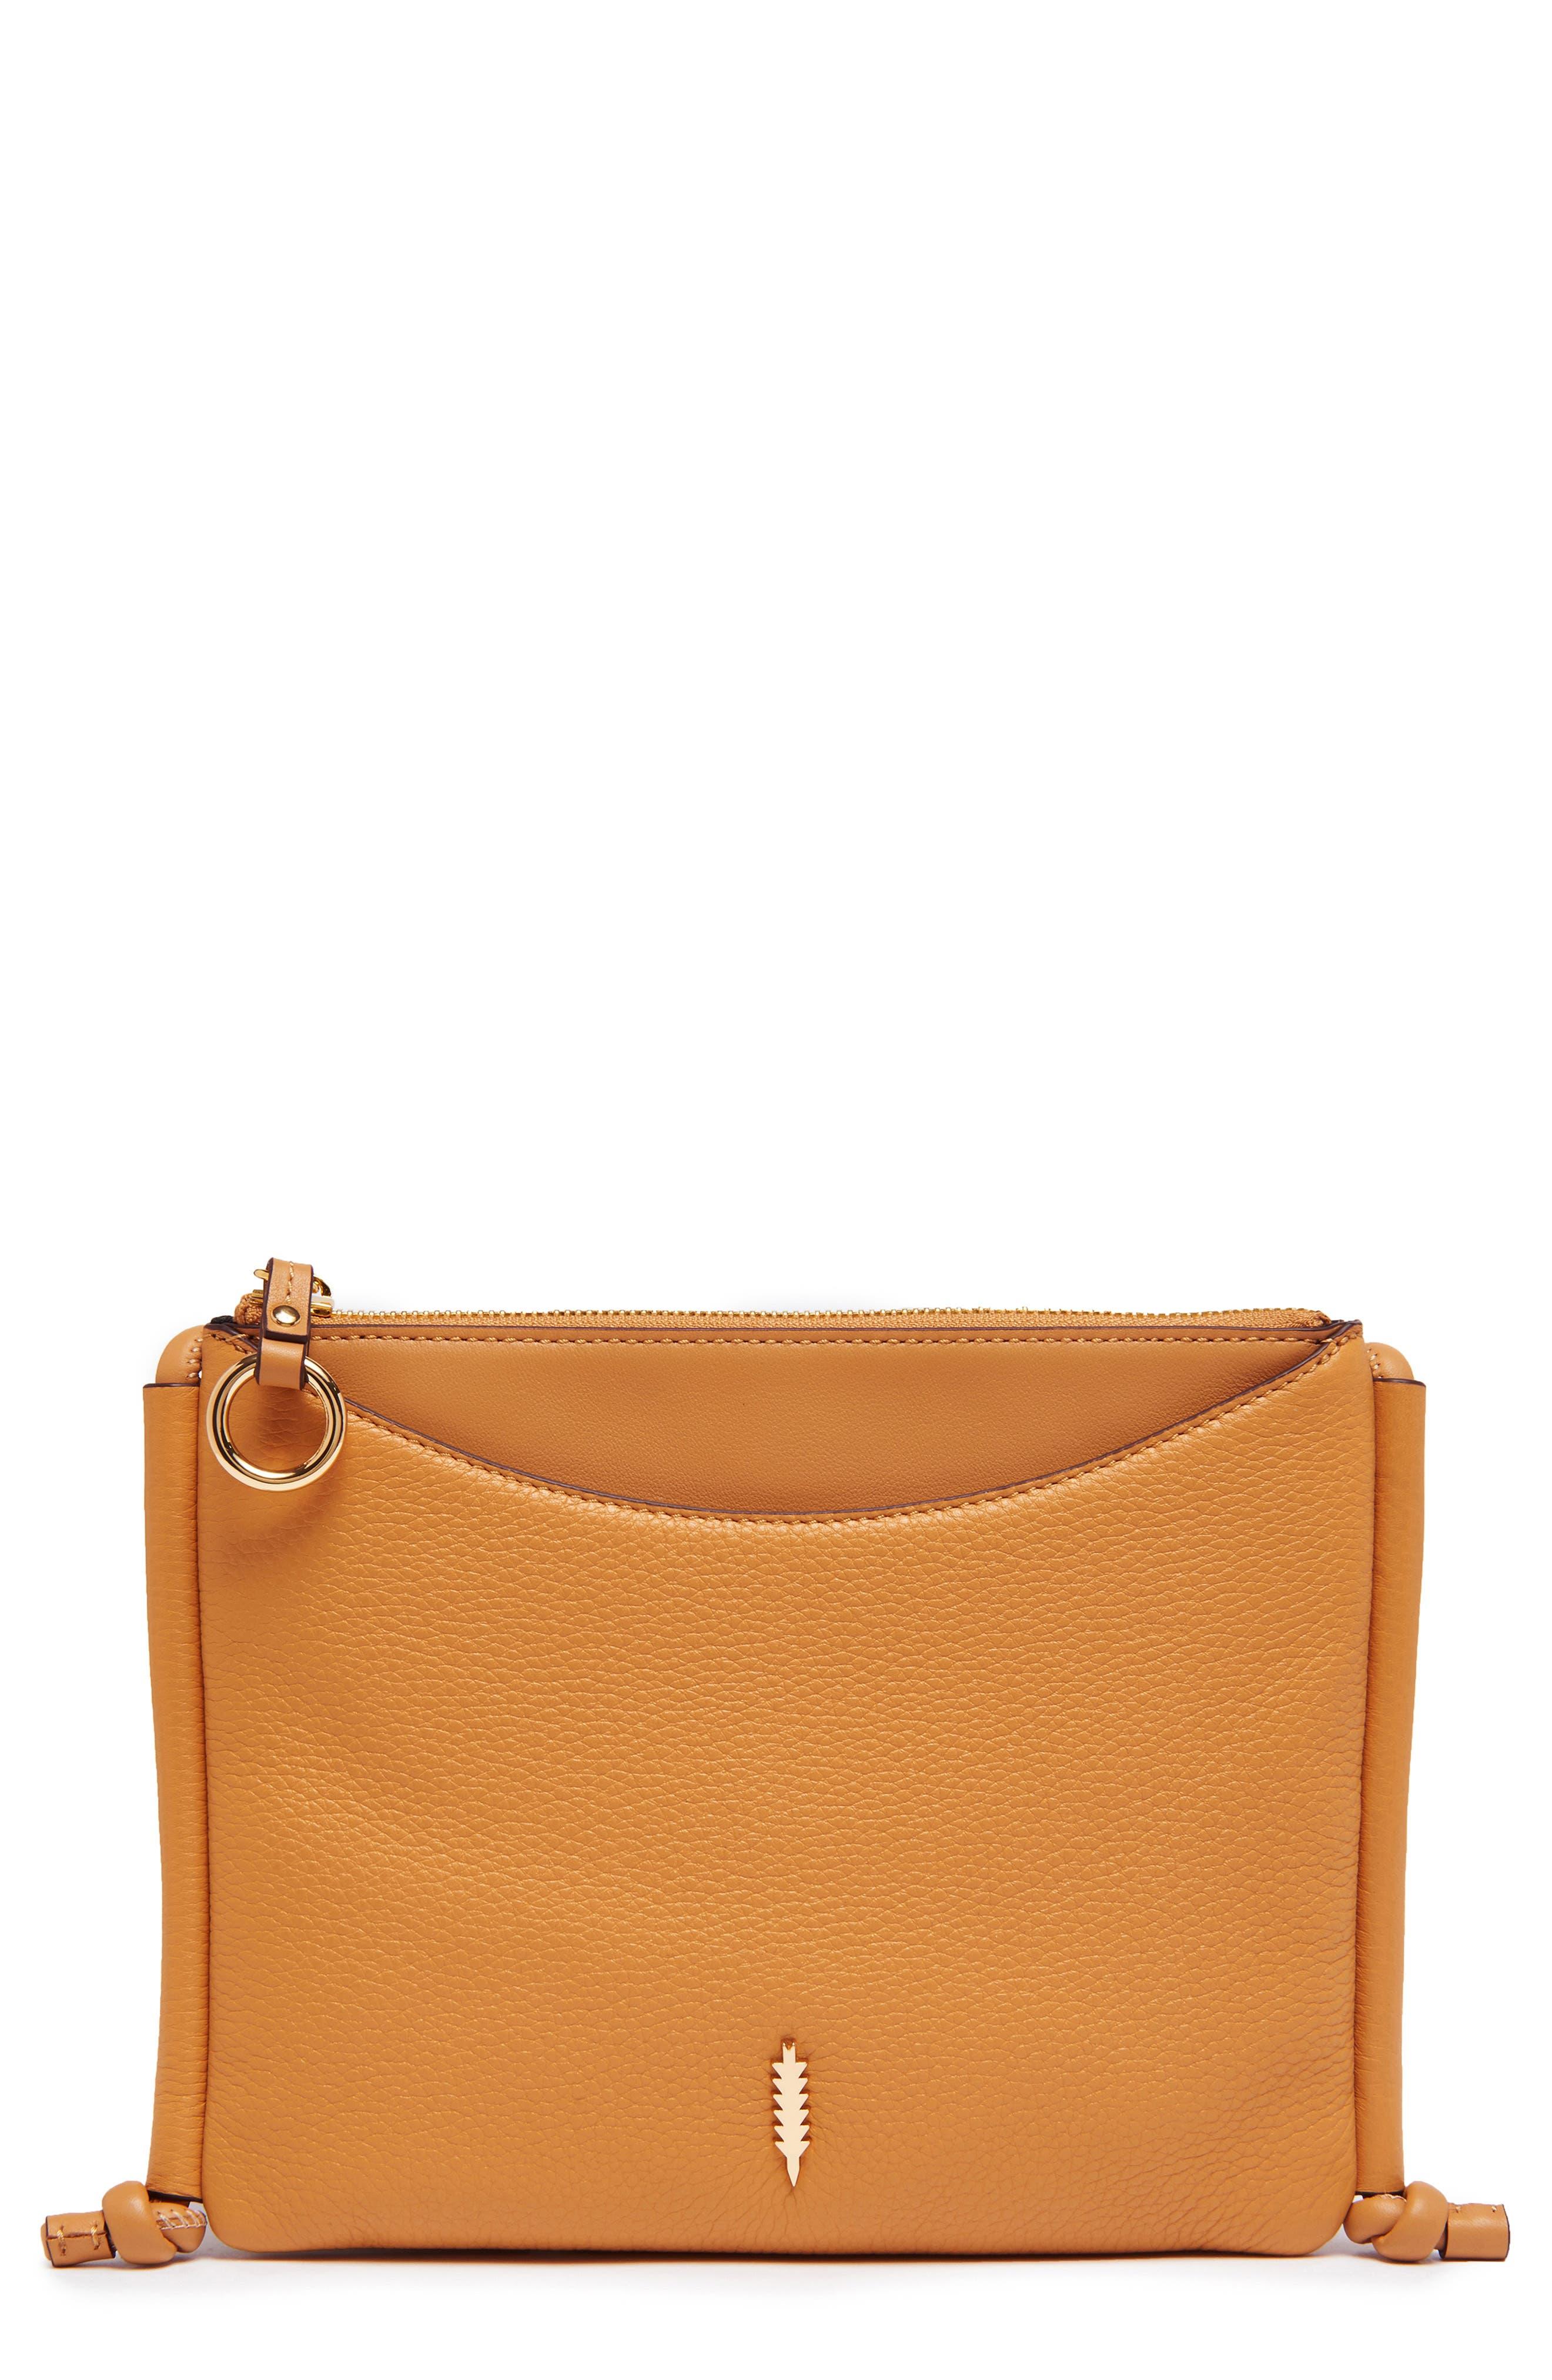 Image of THACKER Dean Crossbody Bag